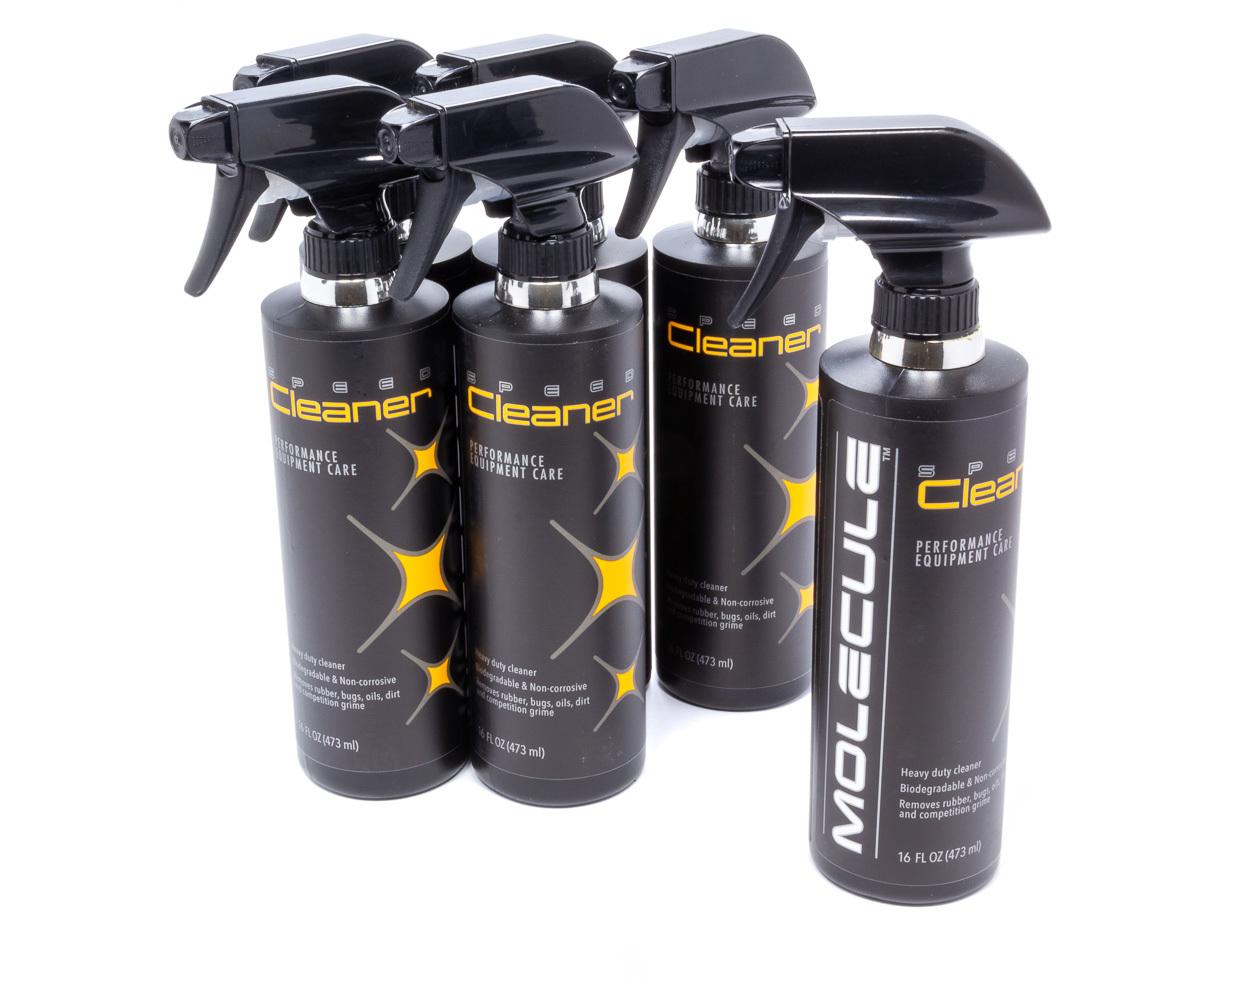 Molecule MLC-16-6 Detailer, Race Car Cleaner, 16 oz Spray Bottle, Set of 6